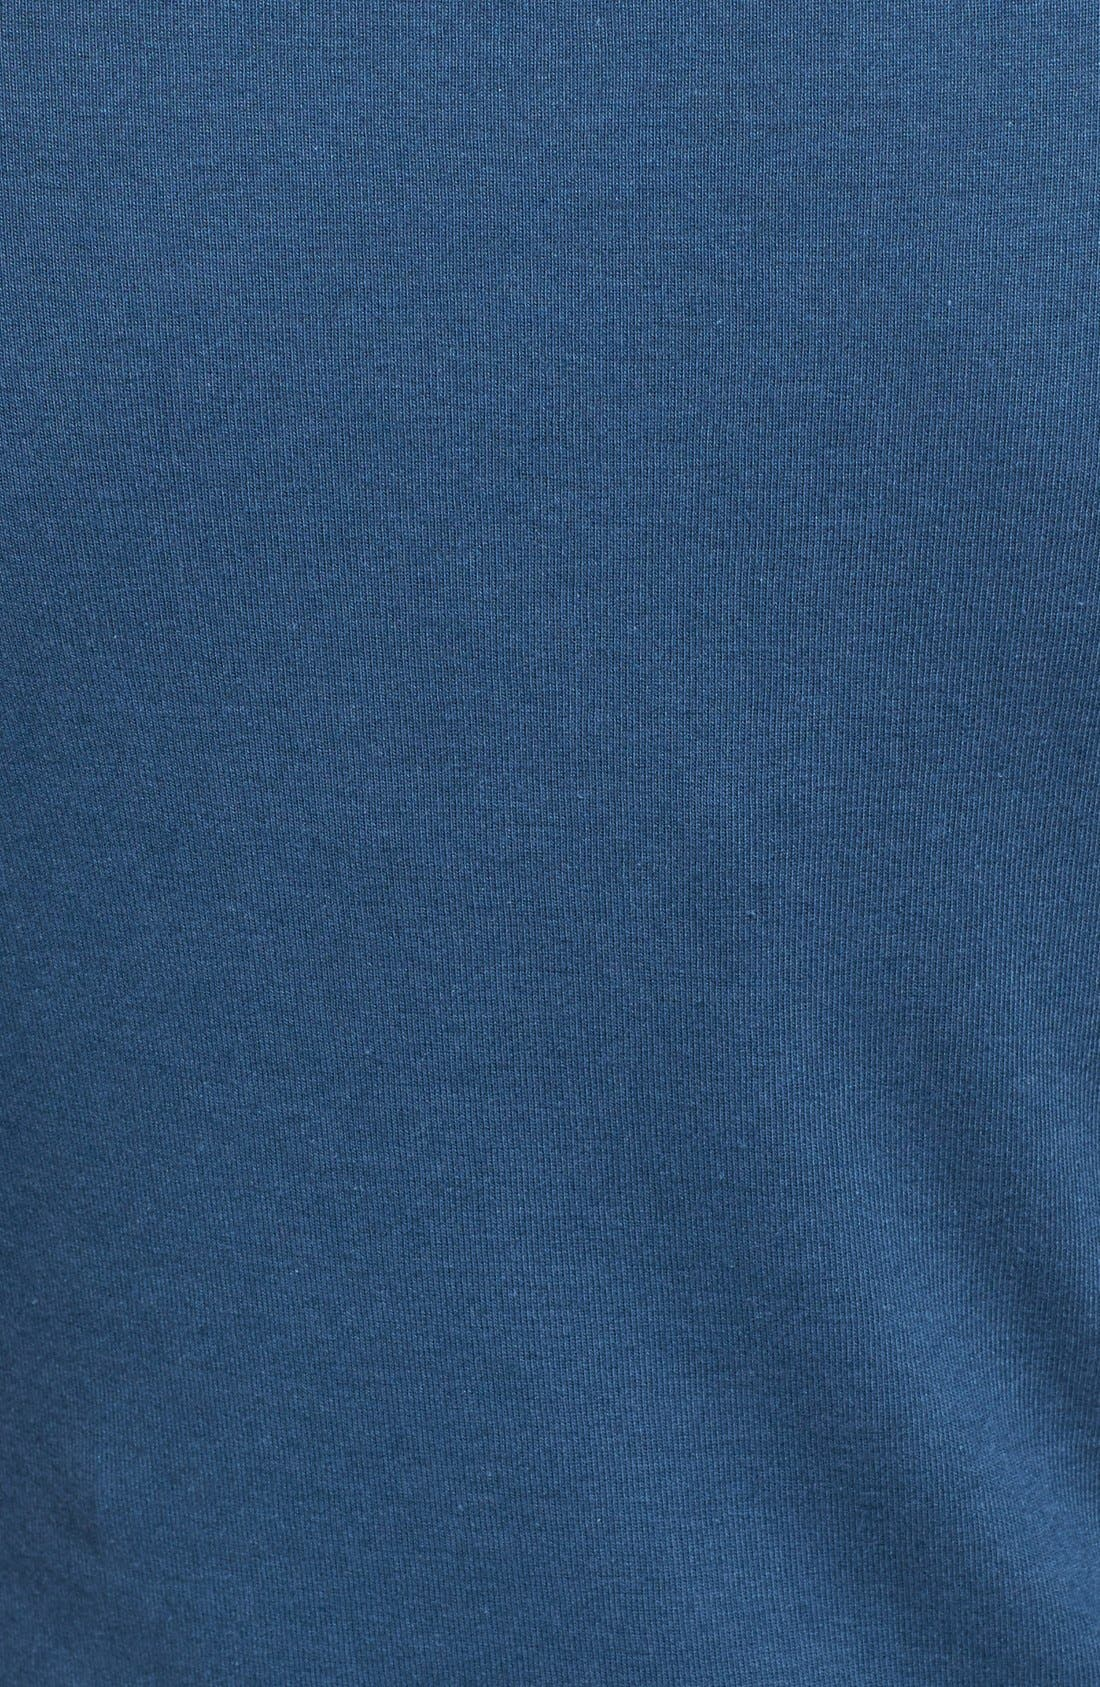 Ballet Neck Cotton & Modal Knit Elbow Sleeve Tee,                             Alternate thumbnail 80, color,